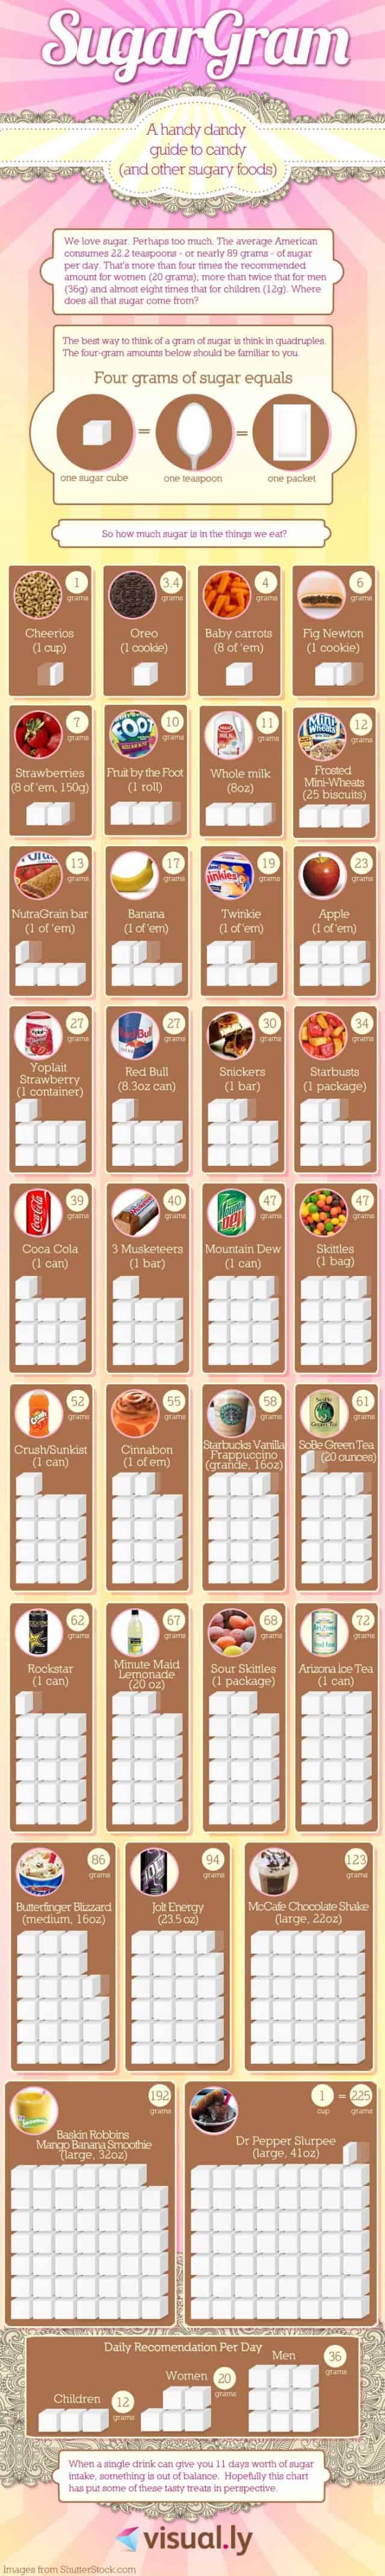 sugar-yum-640x4280